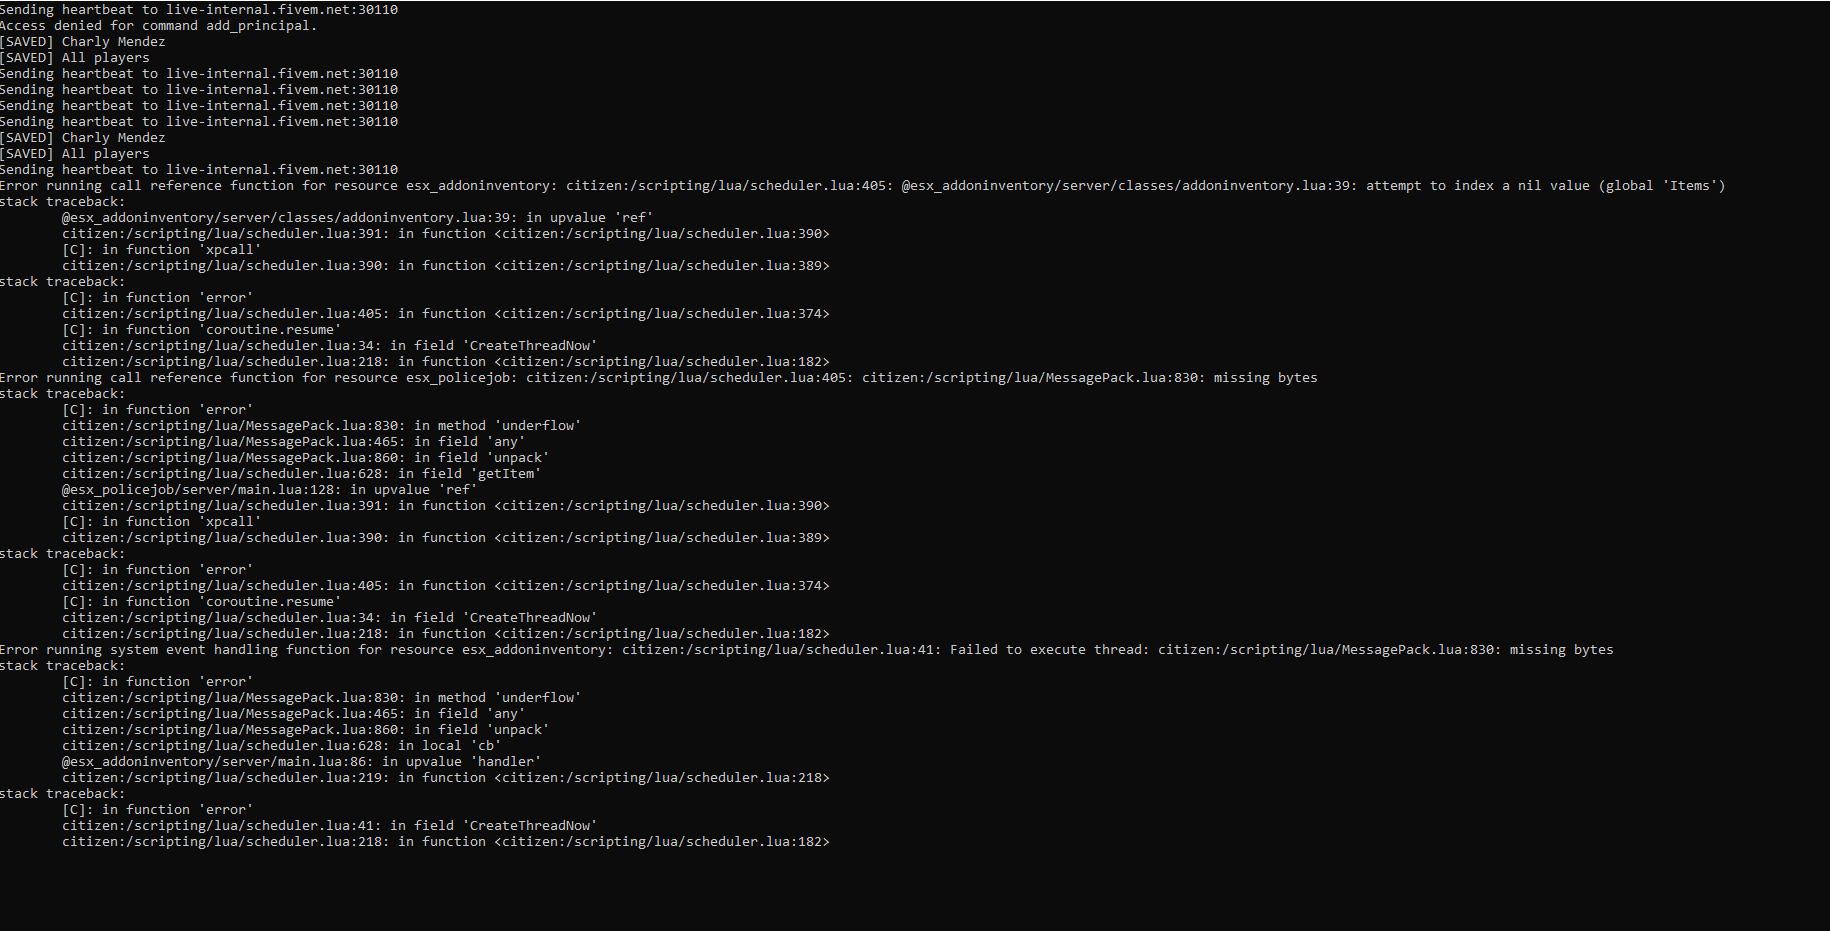 beug addon-inventory - Problèmes scripts - Fivem-france